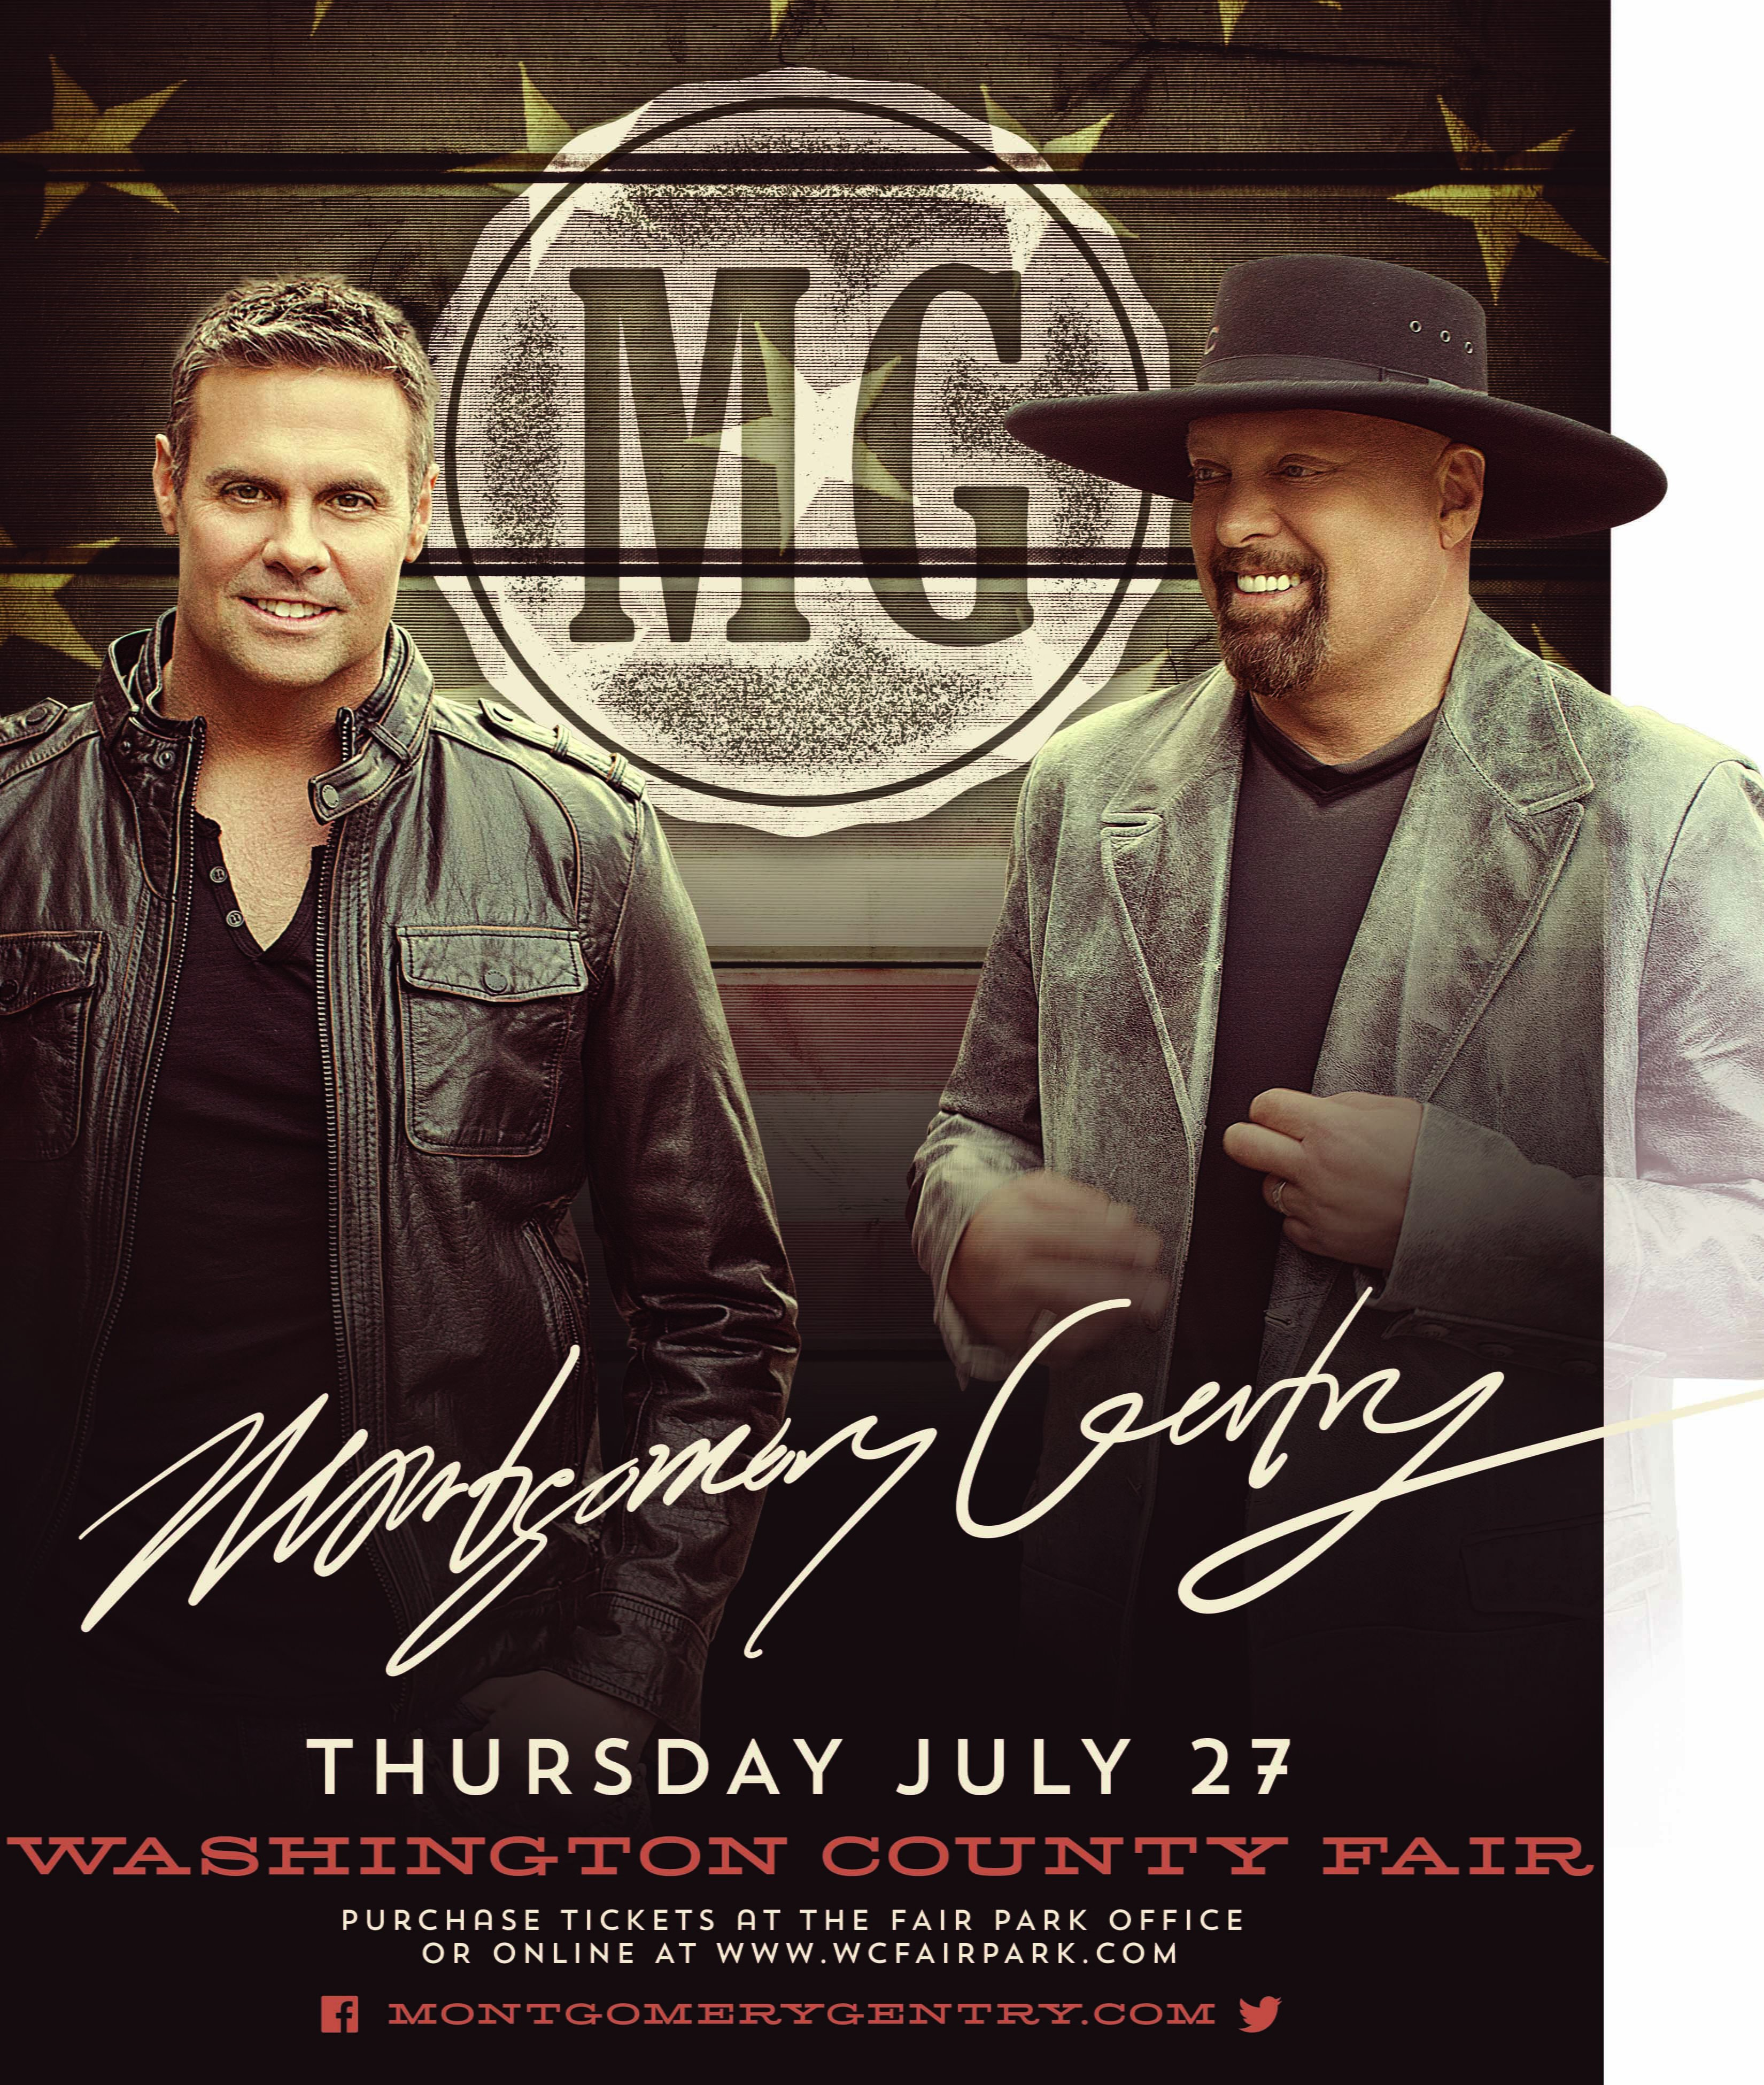 Montgomery County Fair 2020 Entertainment Concert.2017 National Entertainment Announcement Washington County